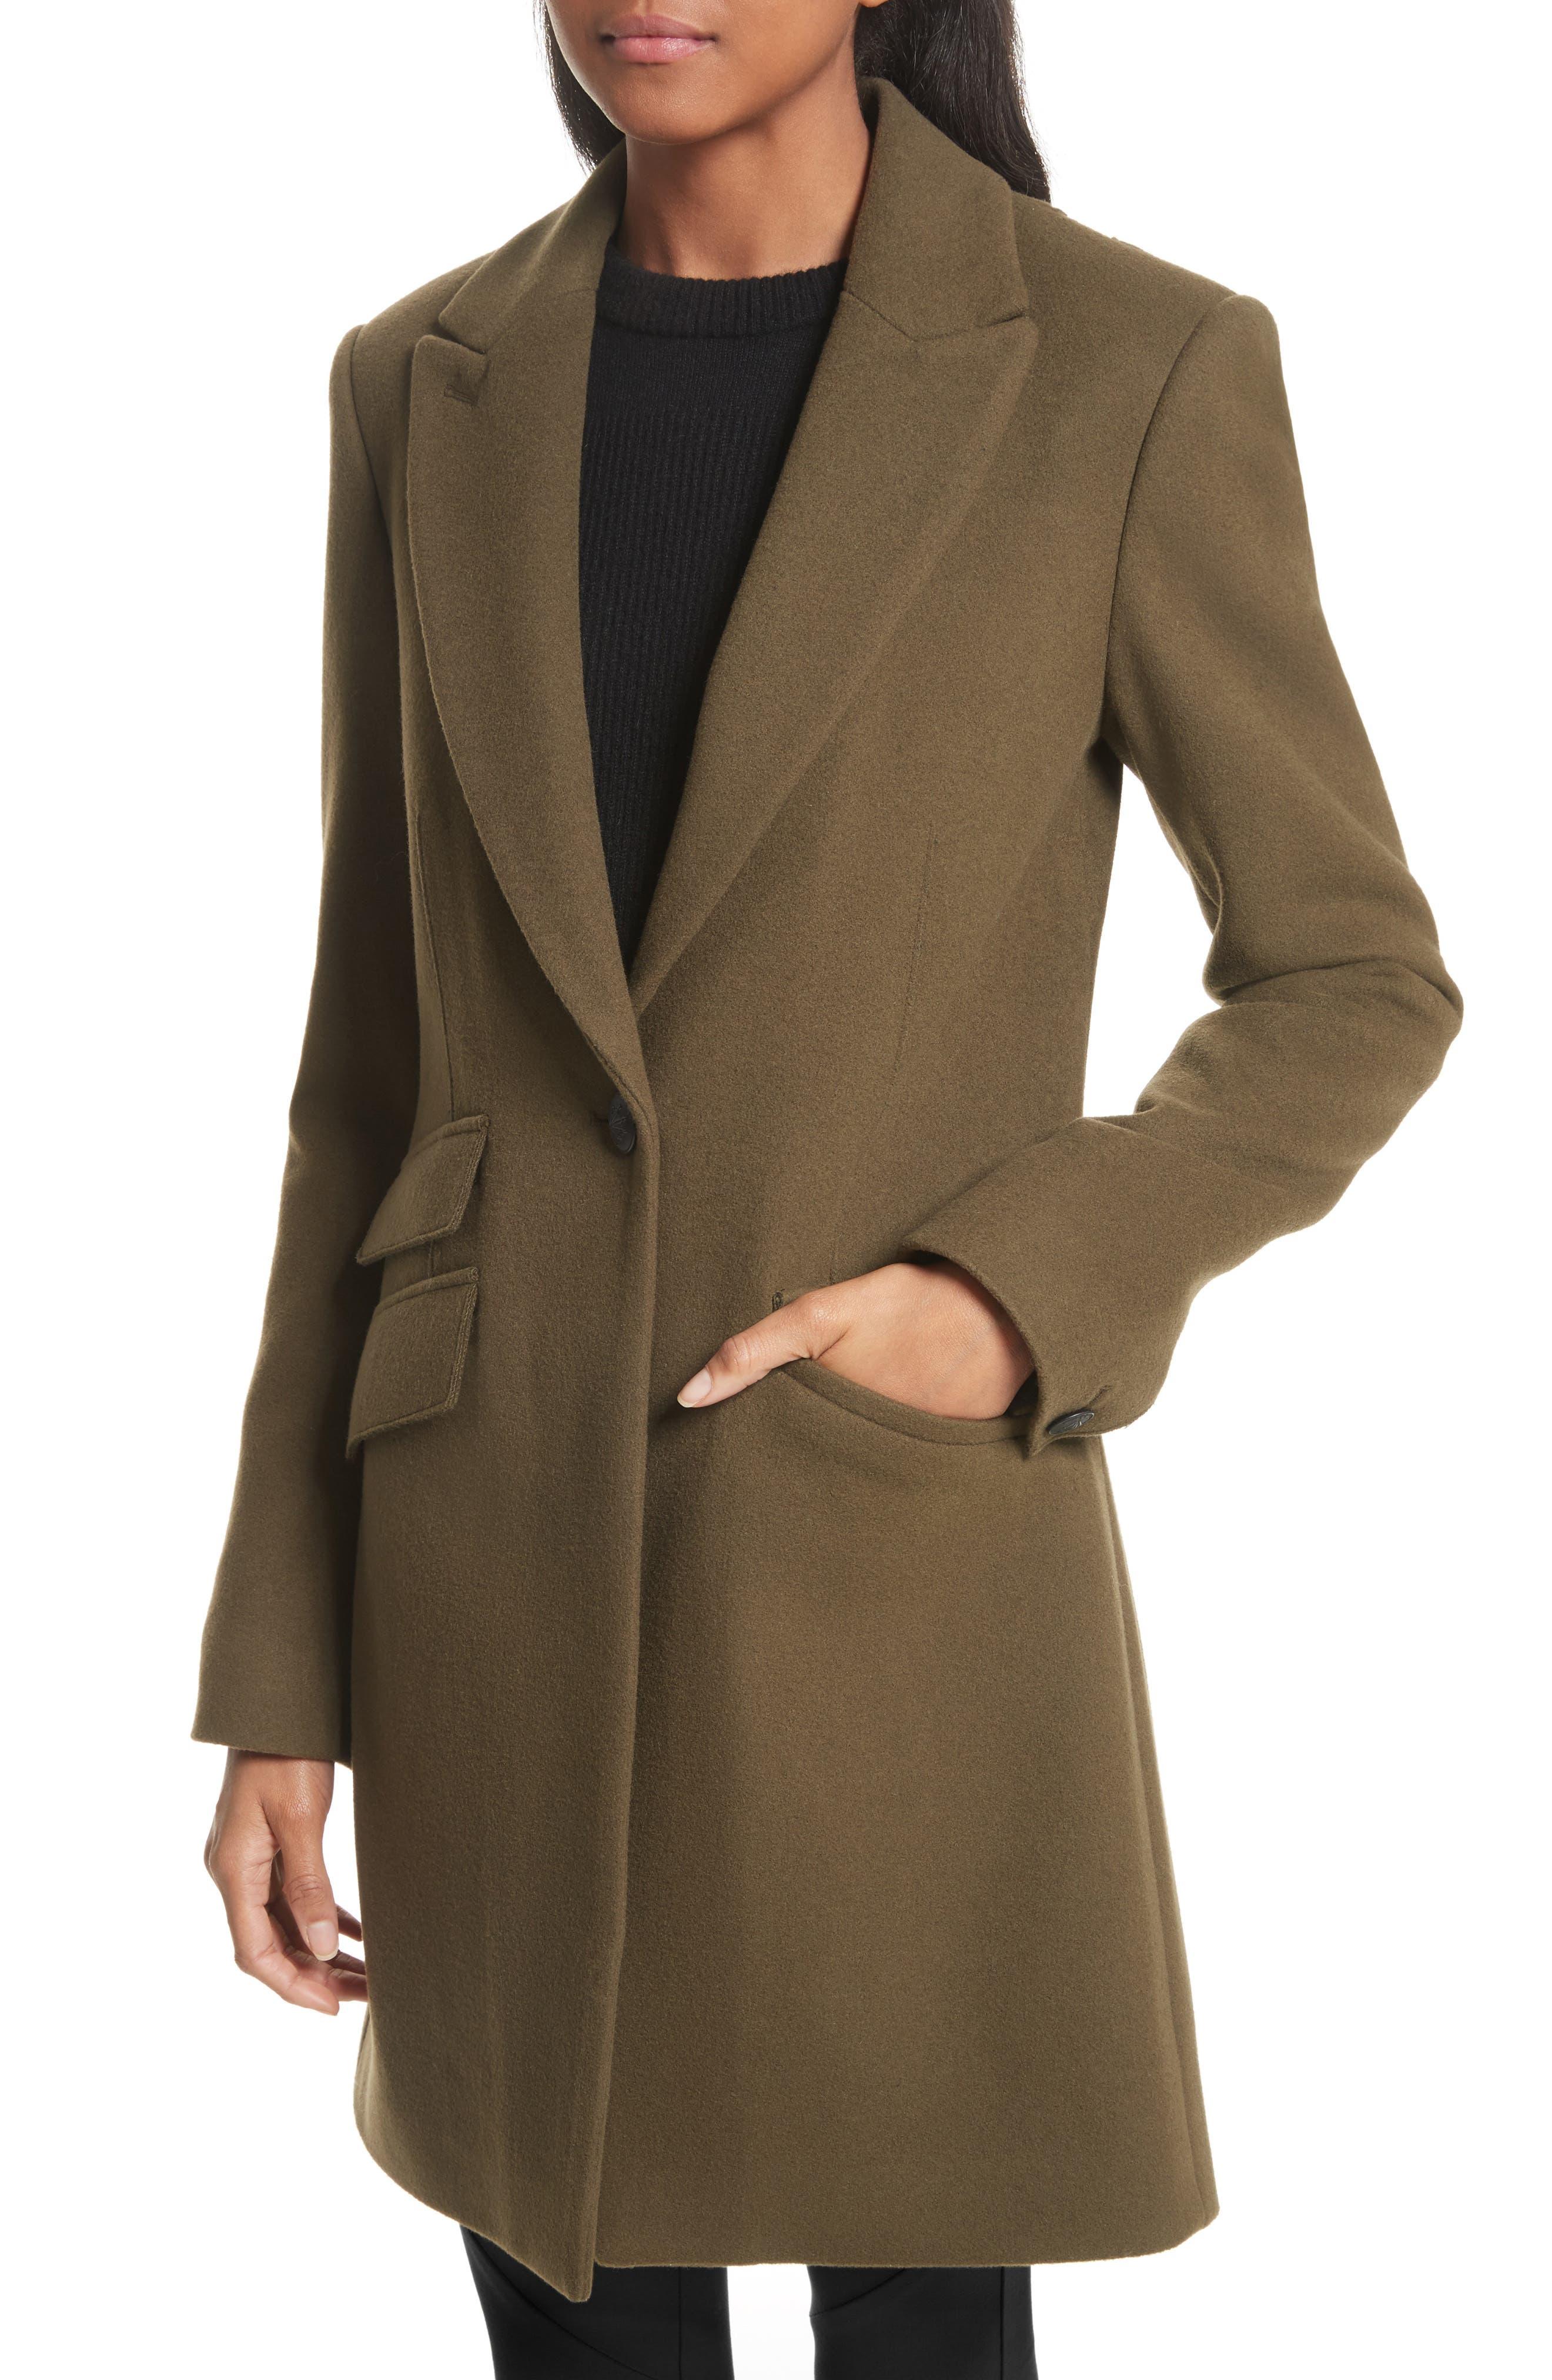 Duchess Wool Blend Coat,                             Alternate thumbnail 4, color,                             325